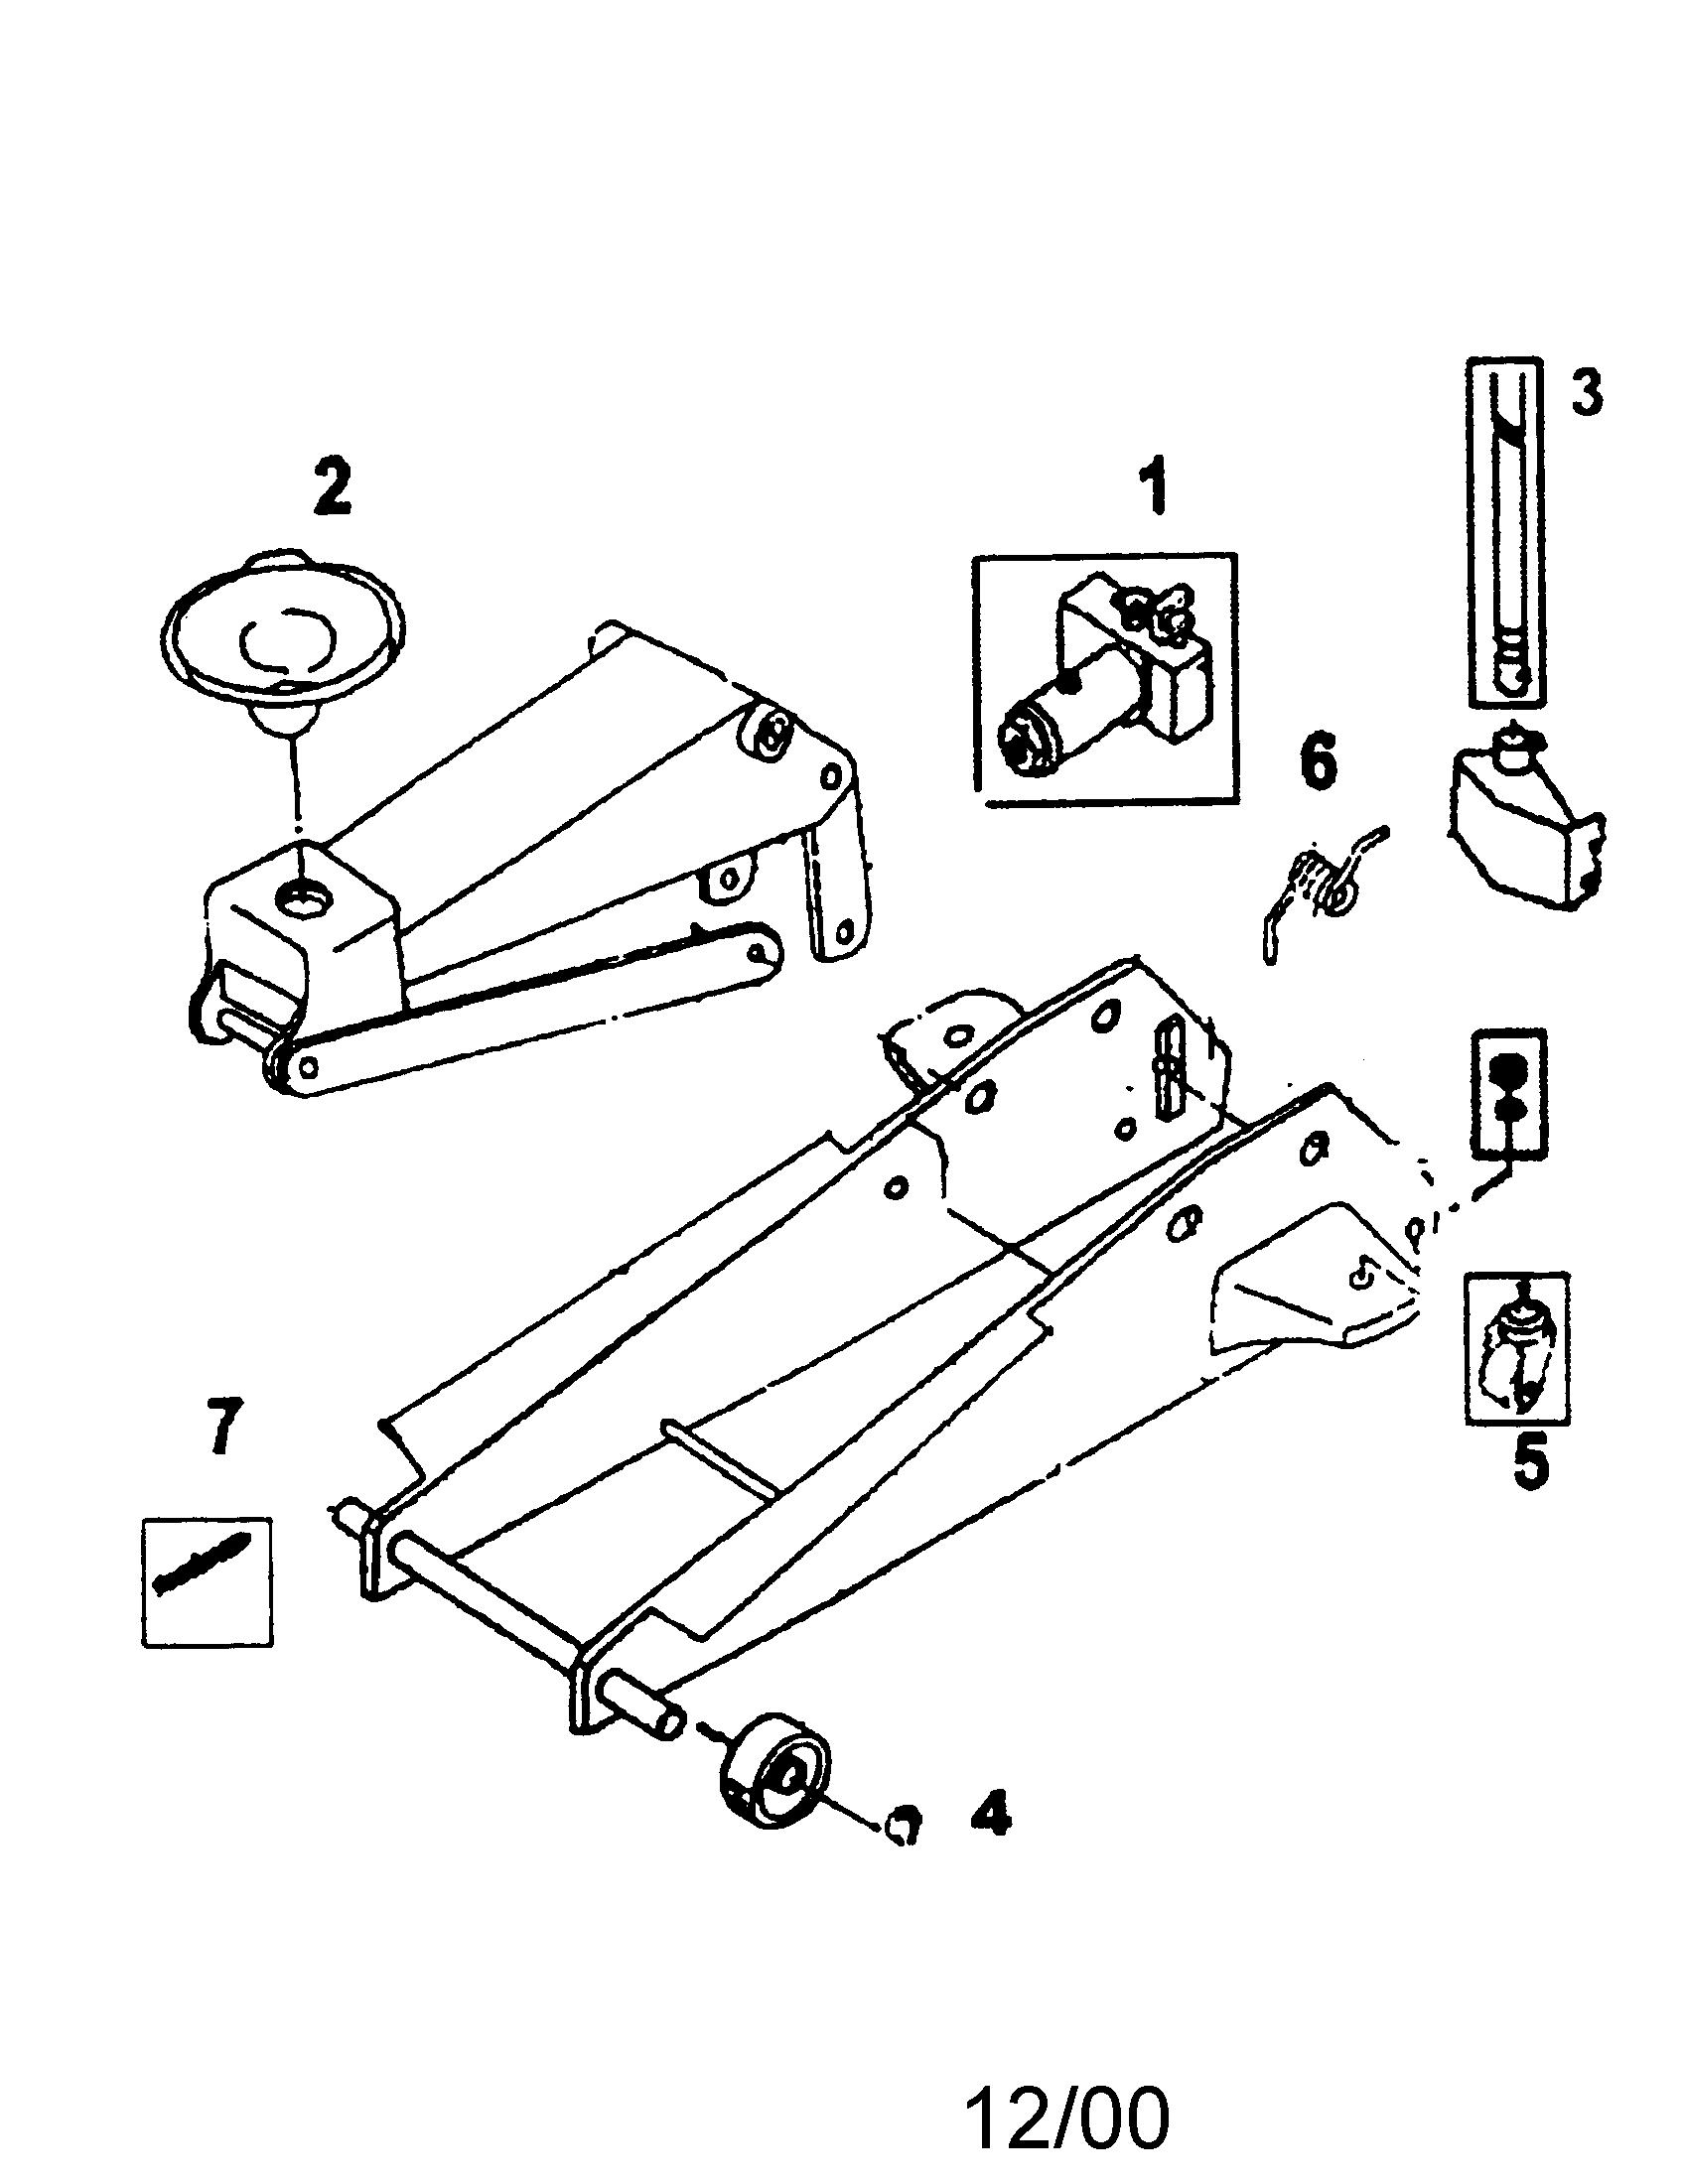 Hydraulic Floor Jack Repair Manual